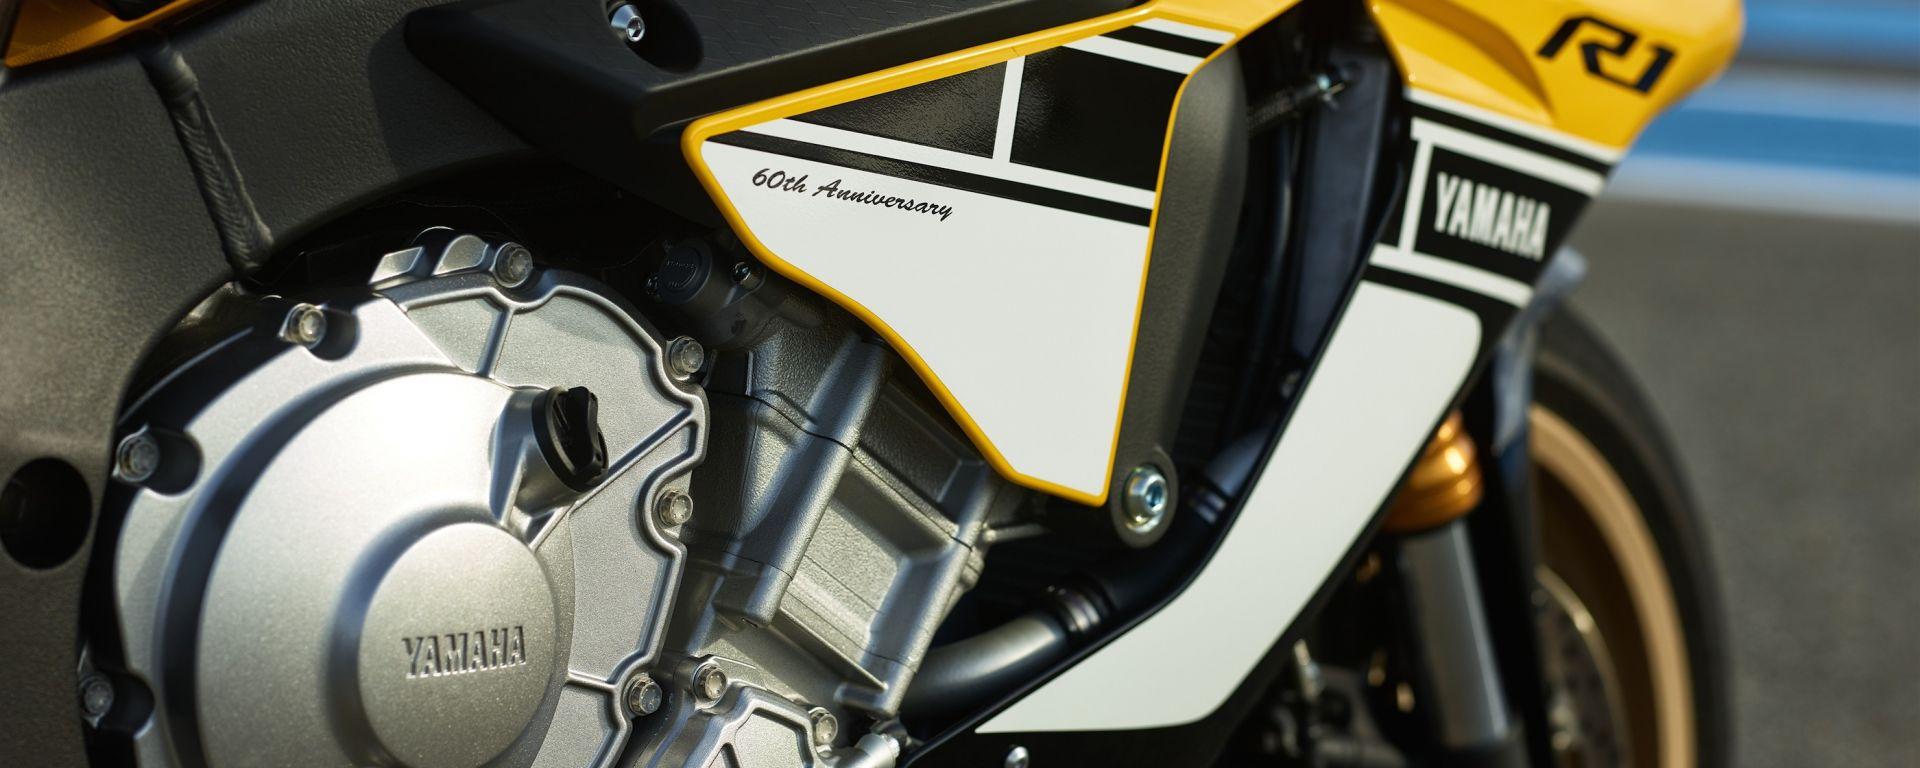 Yamaha YZF-R1 60th Anniversary Edition